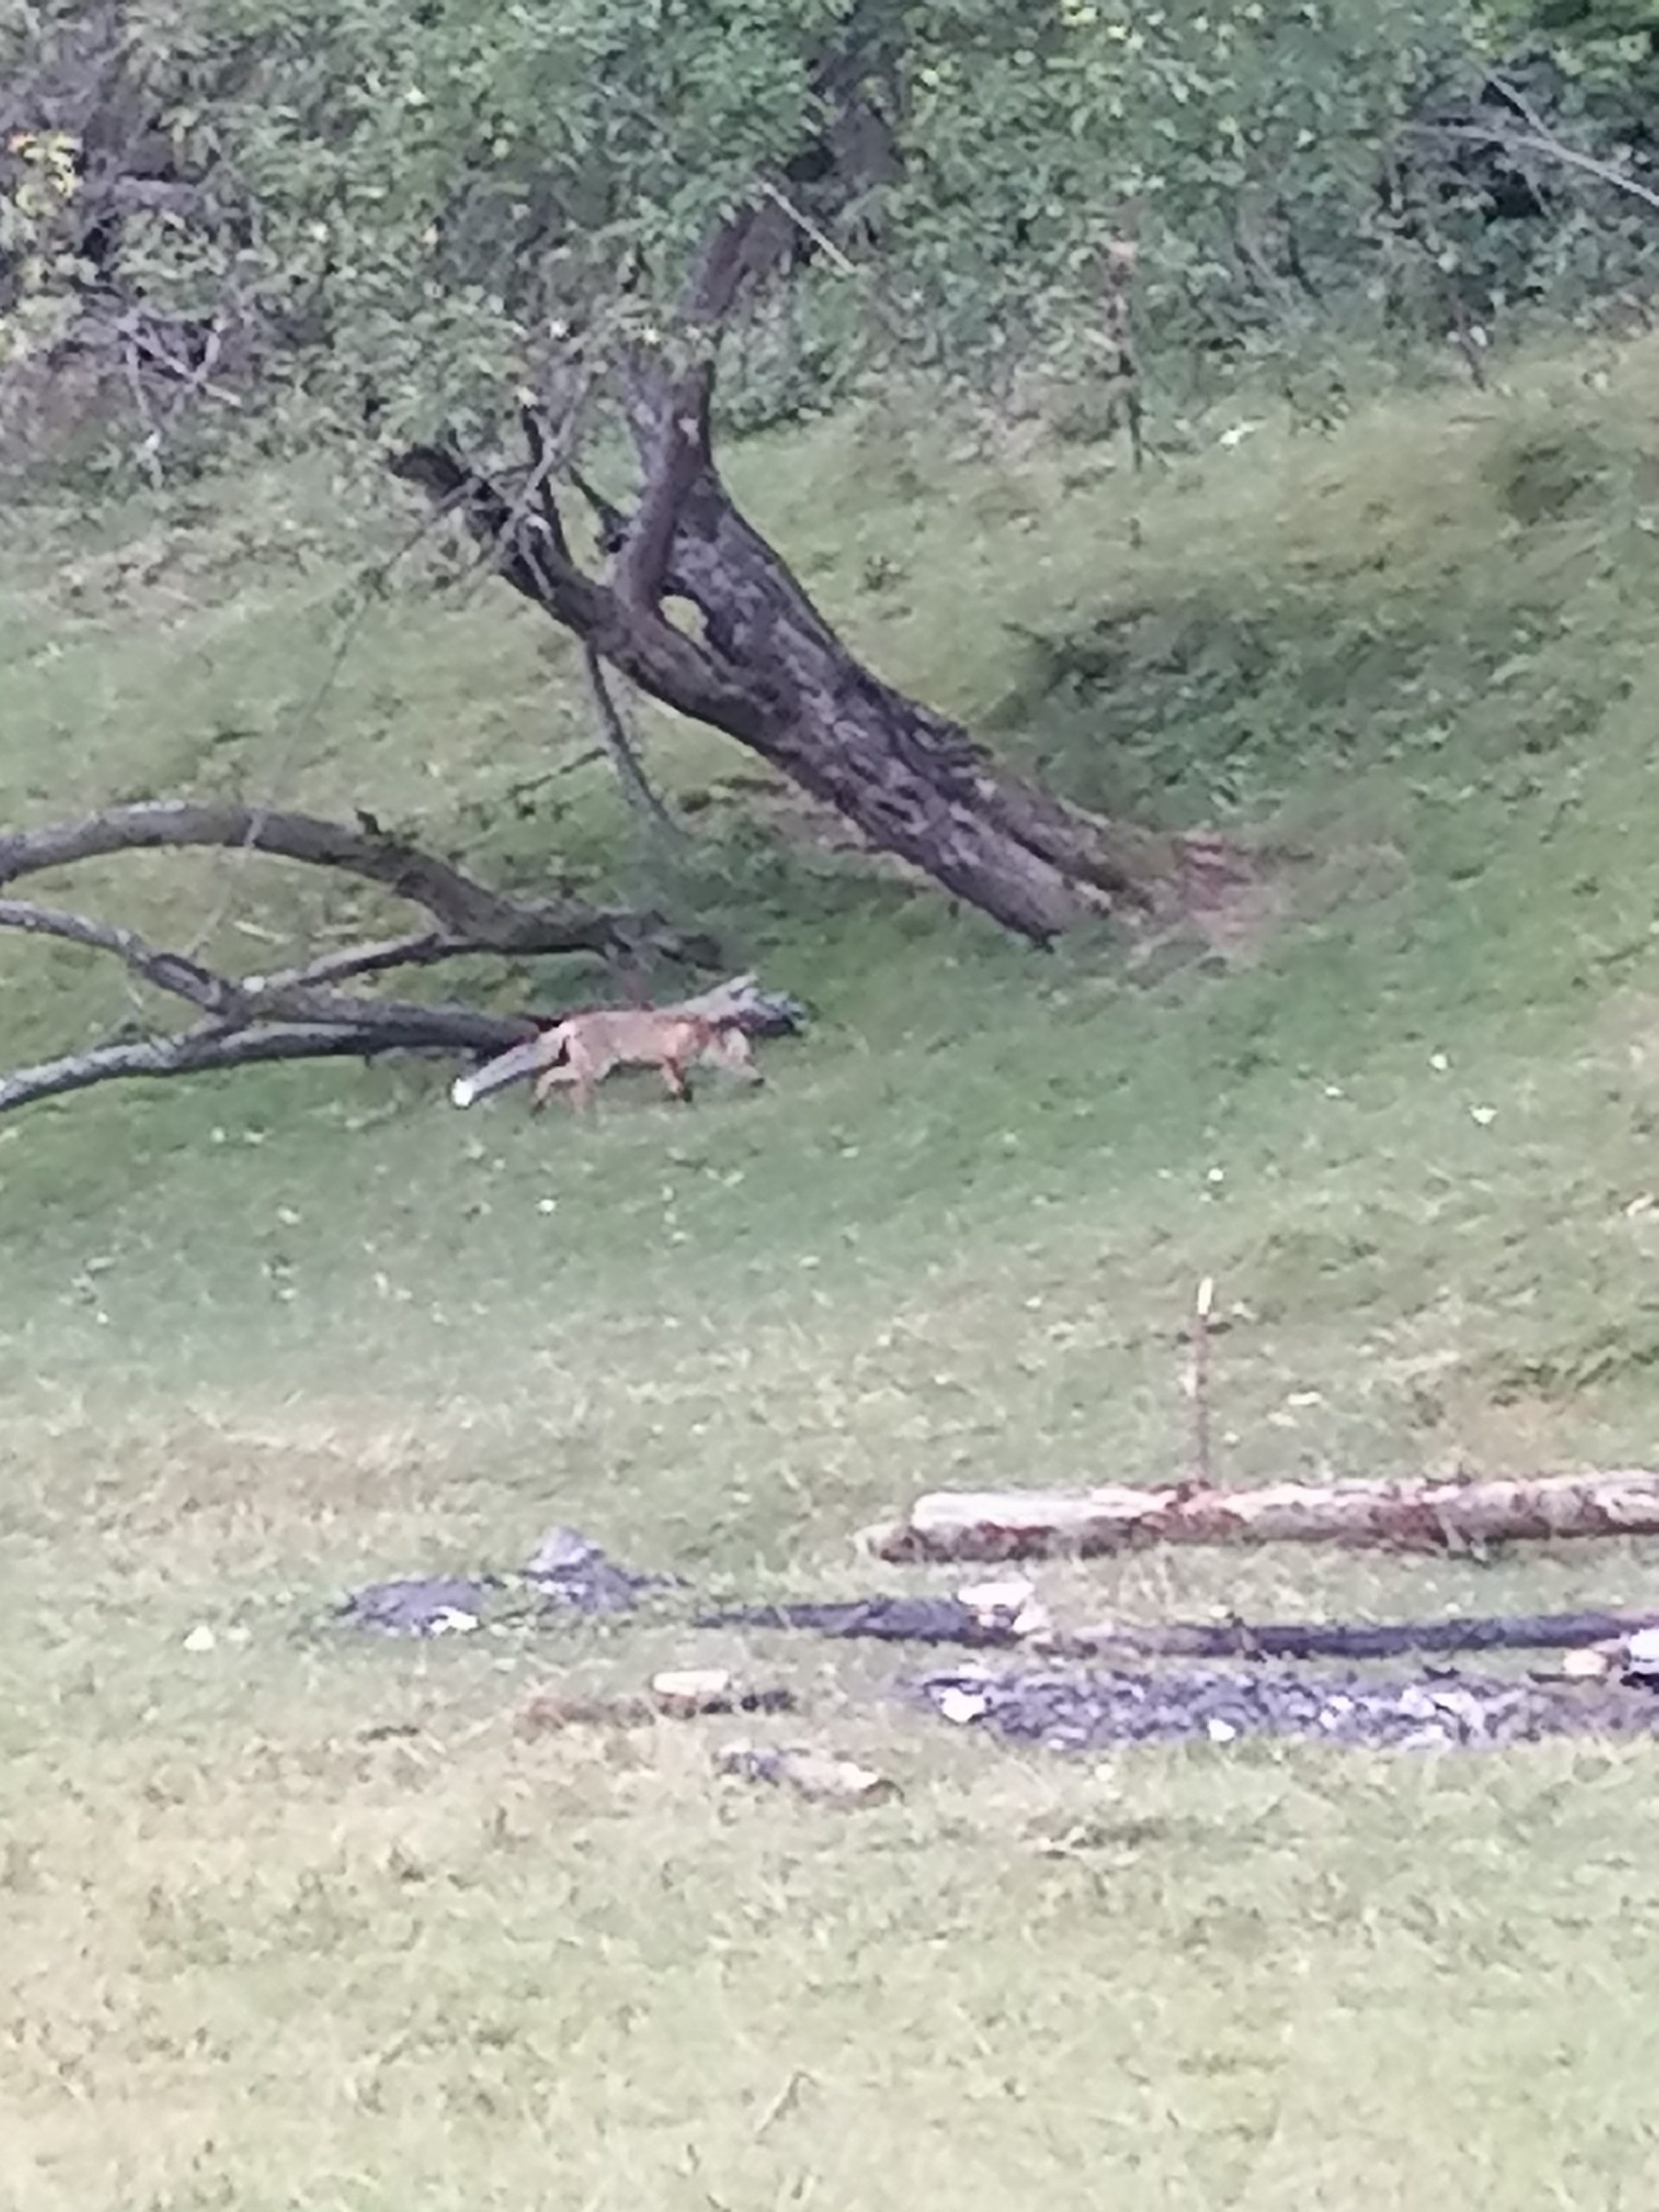 Am hrănit o vulpe – [2]